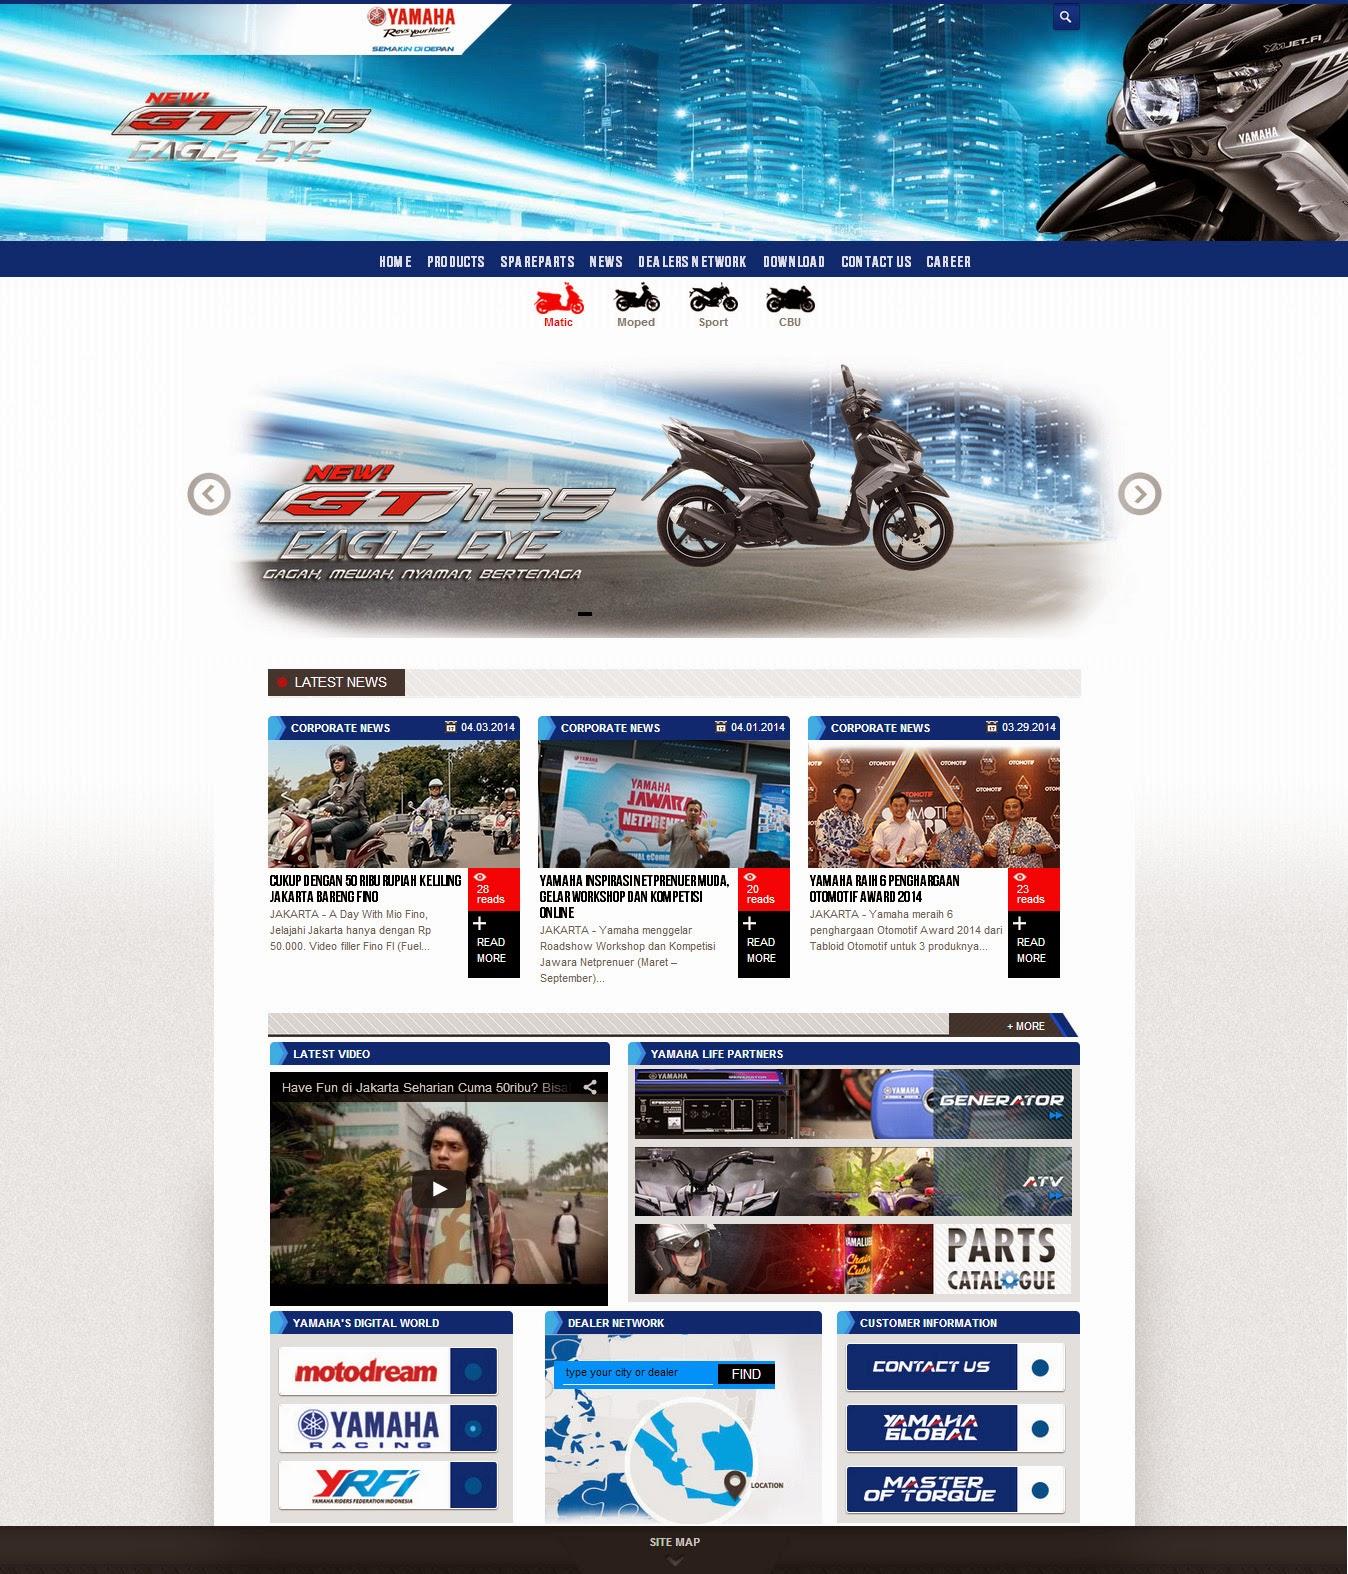 tampilan baru website resmi yamaha indonesia oprek motor